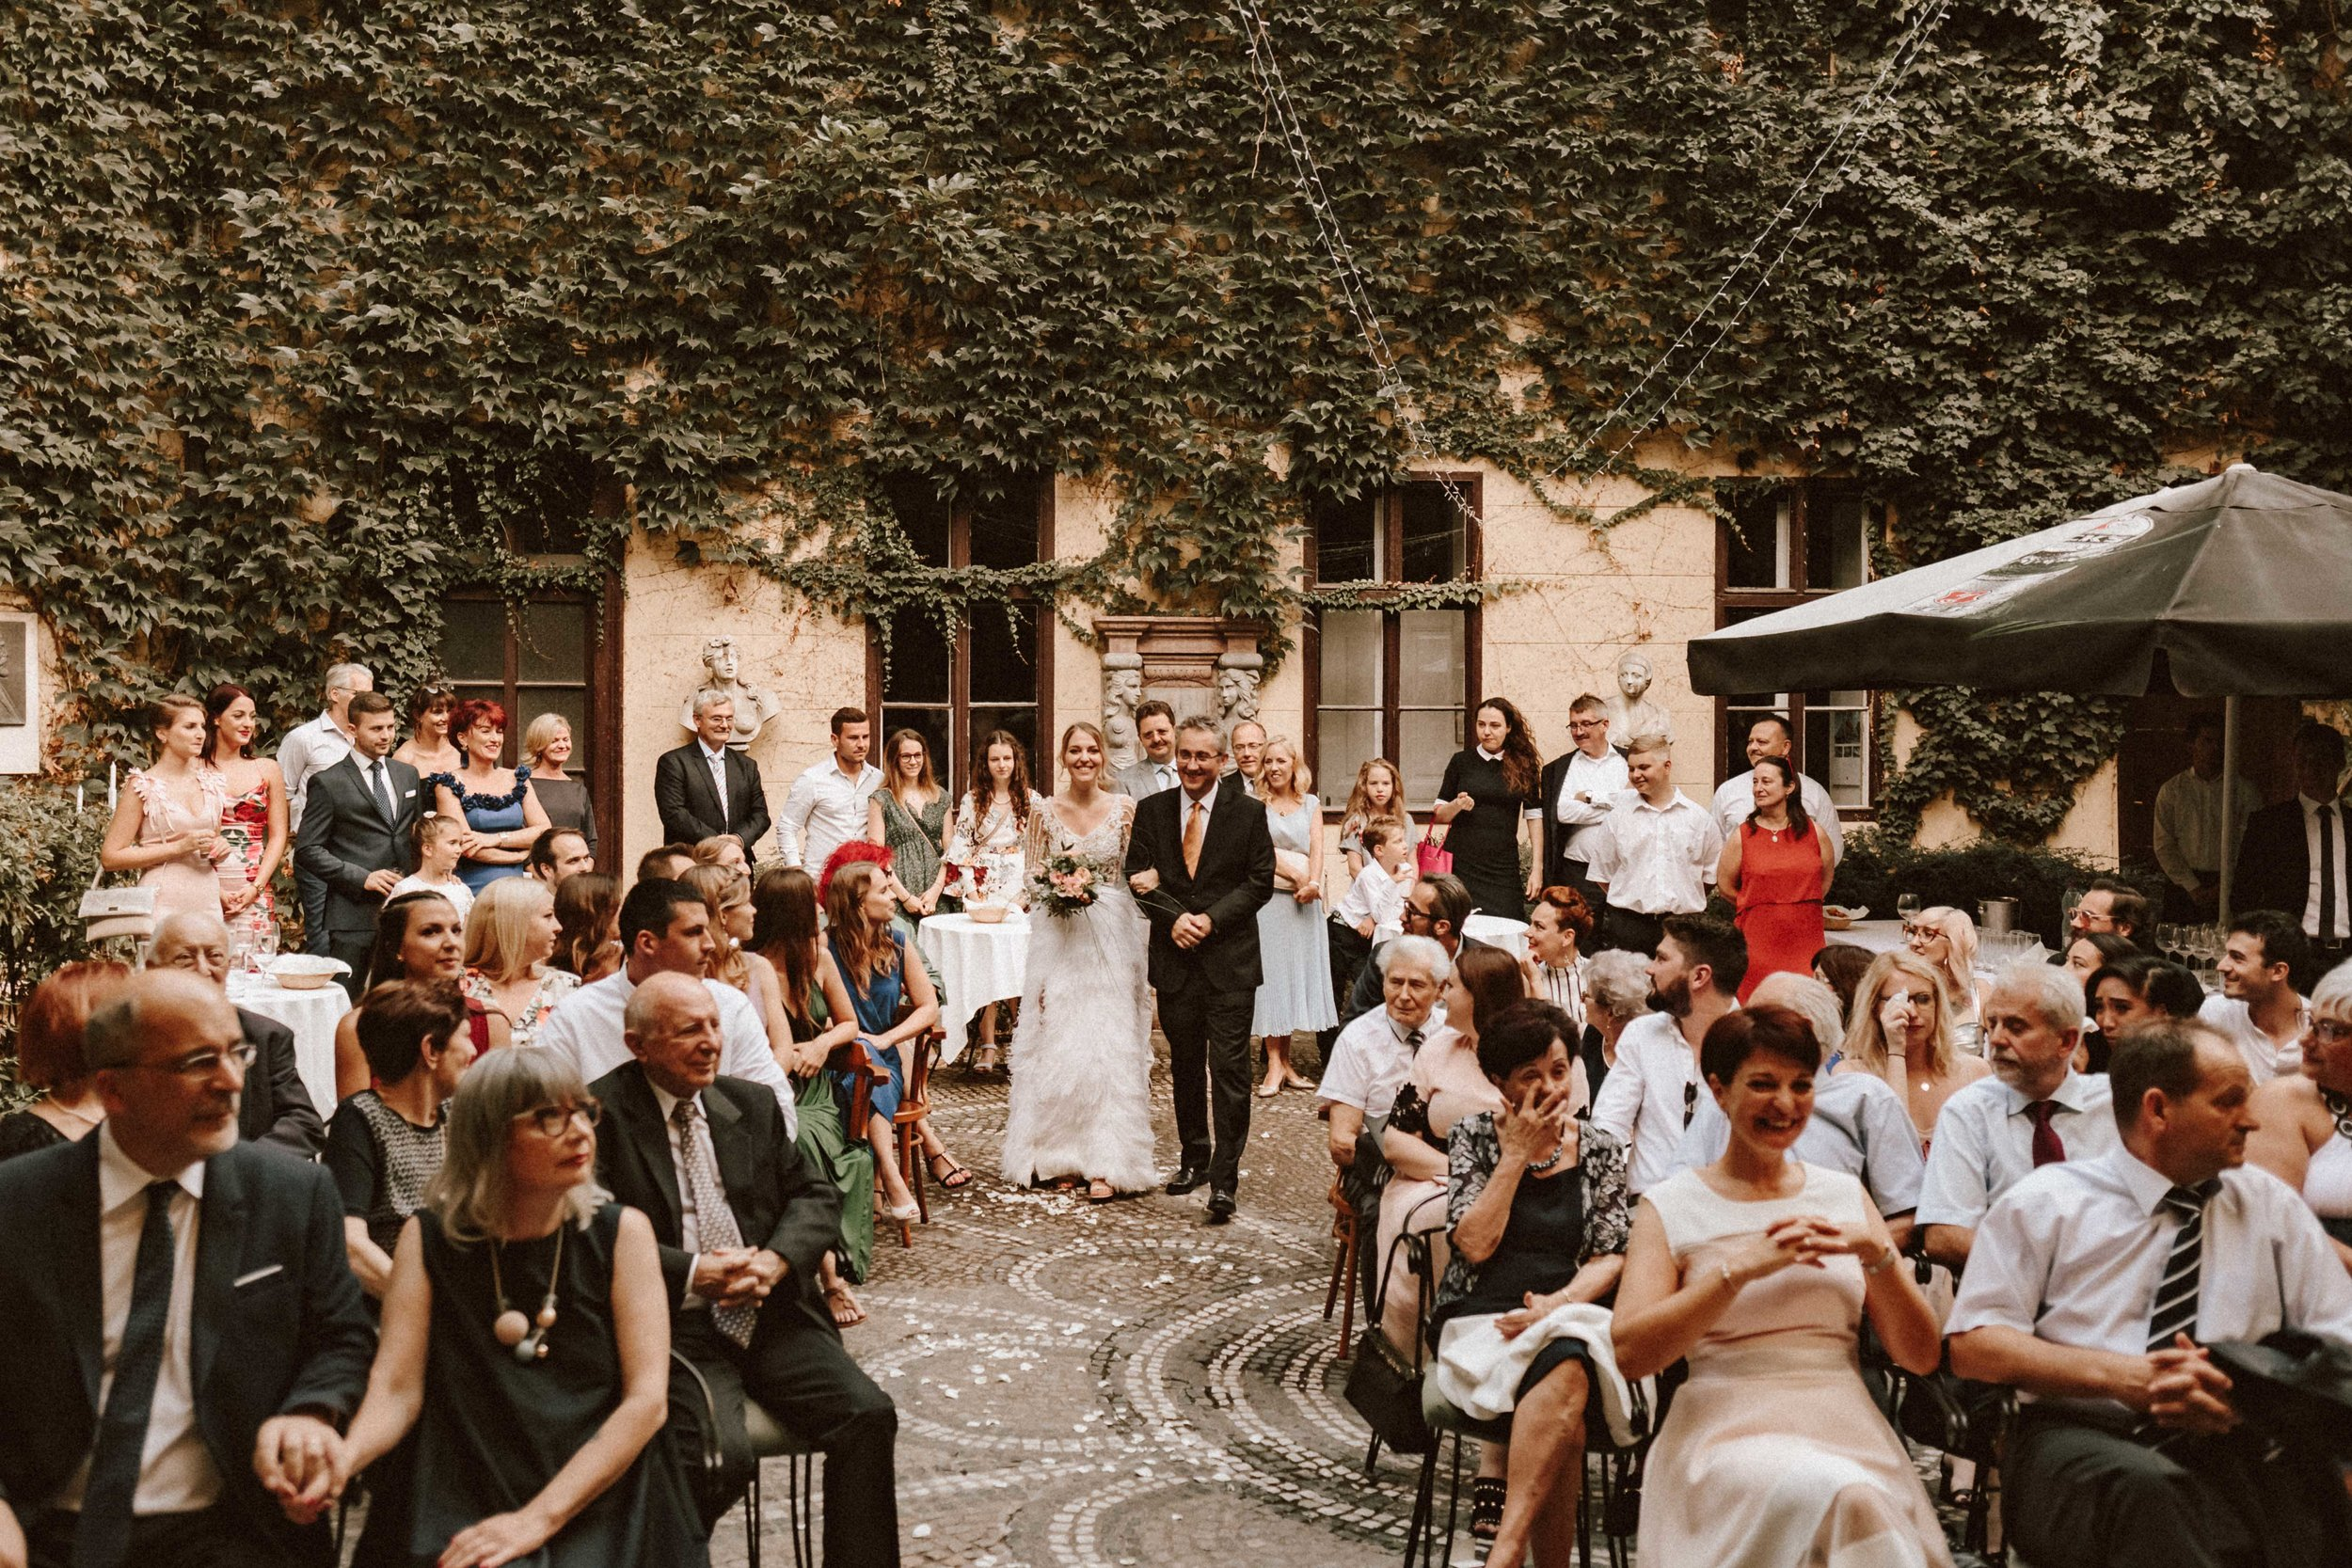 1819-Evelin+Peti-wedding-229-w.jpg